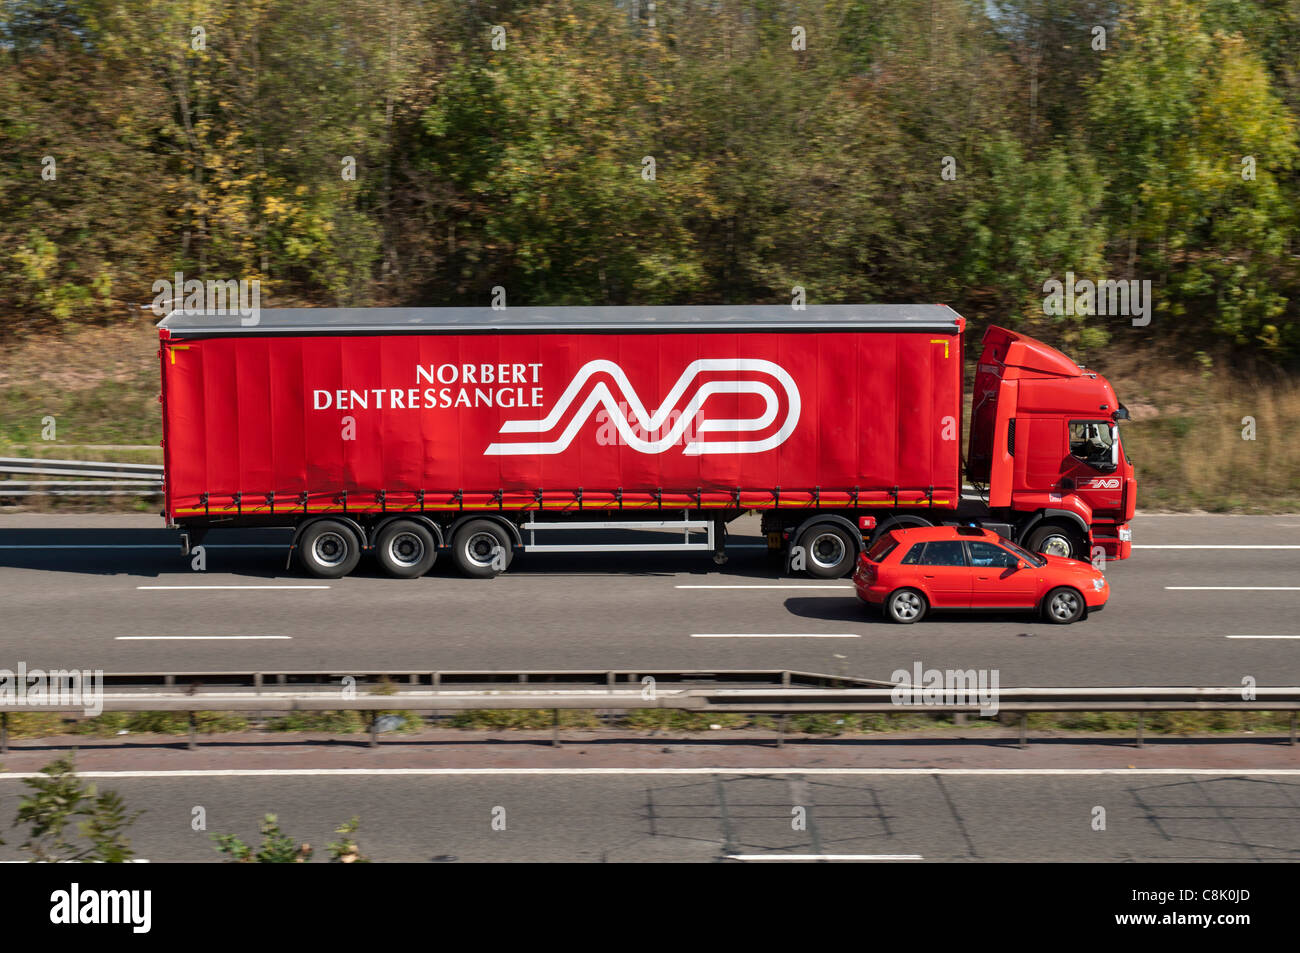 Norbert Dentressangle lorry on M40 motorway, Warwickshire, UK Stock Photo